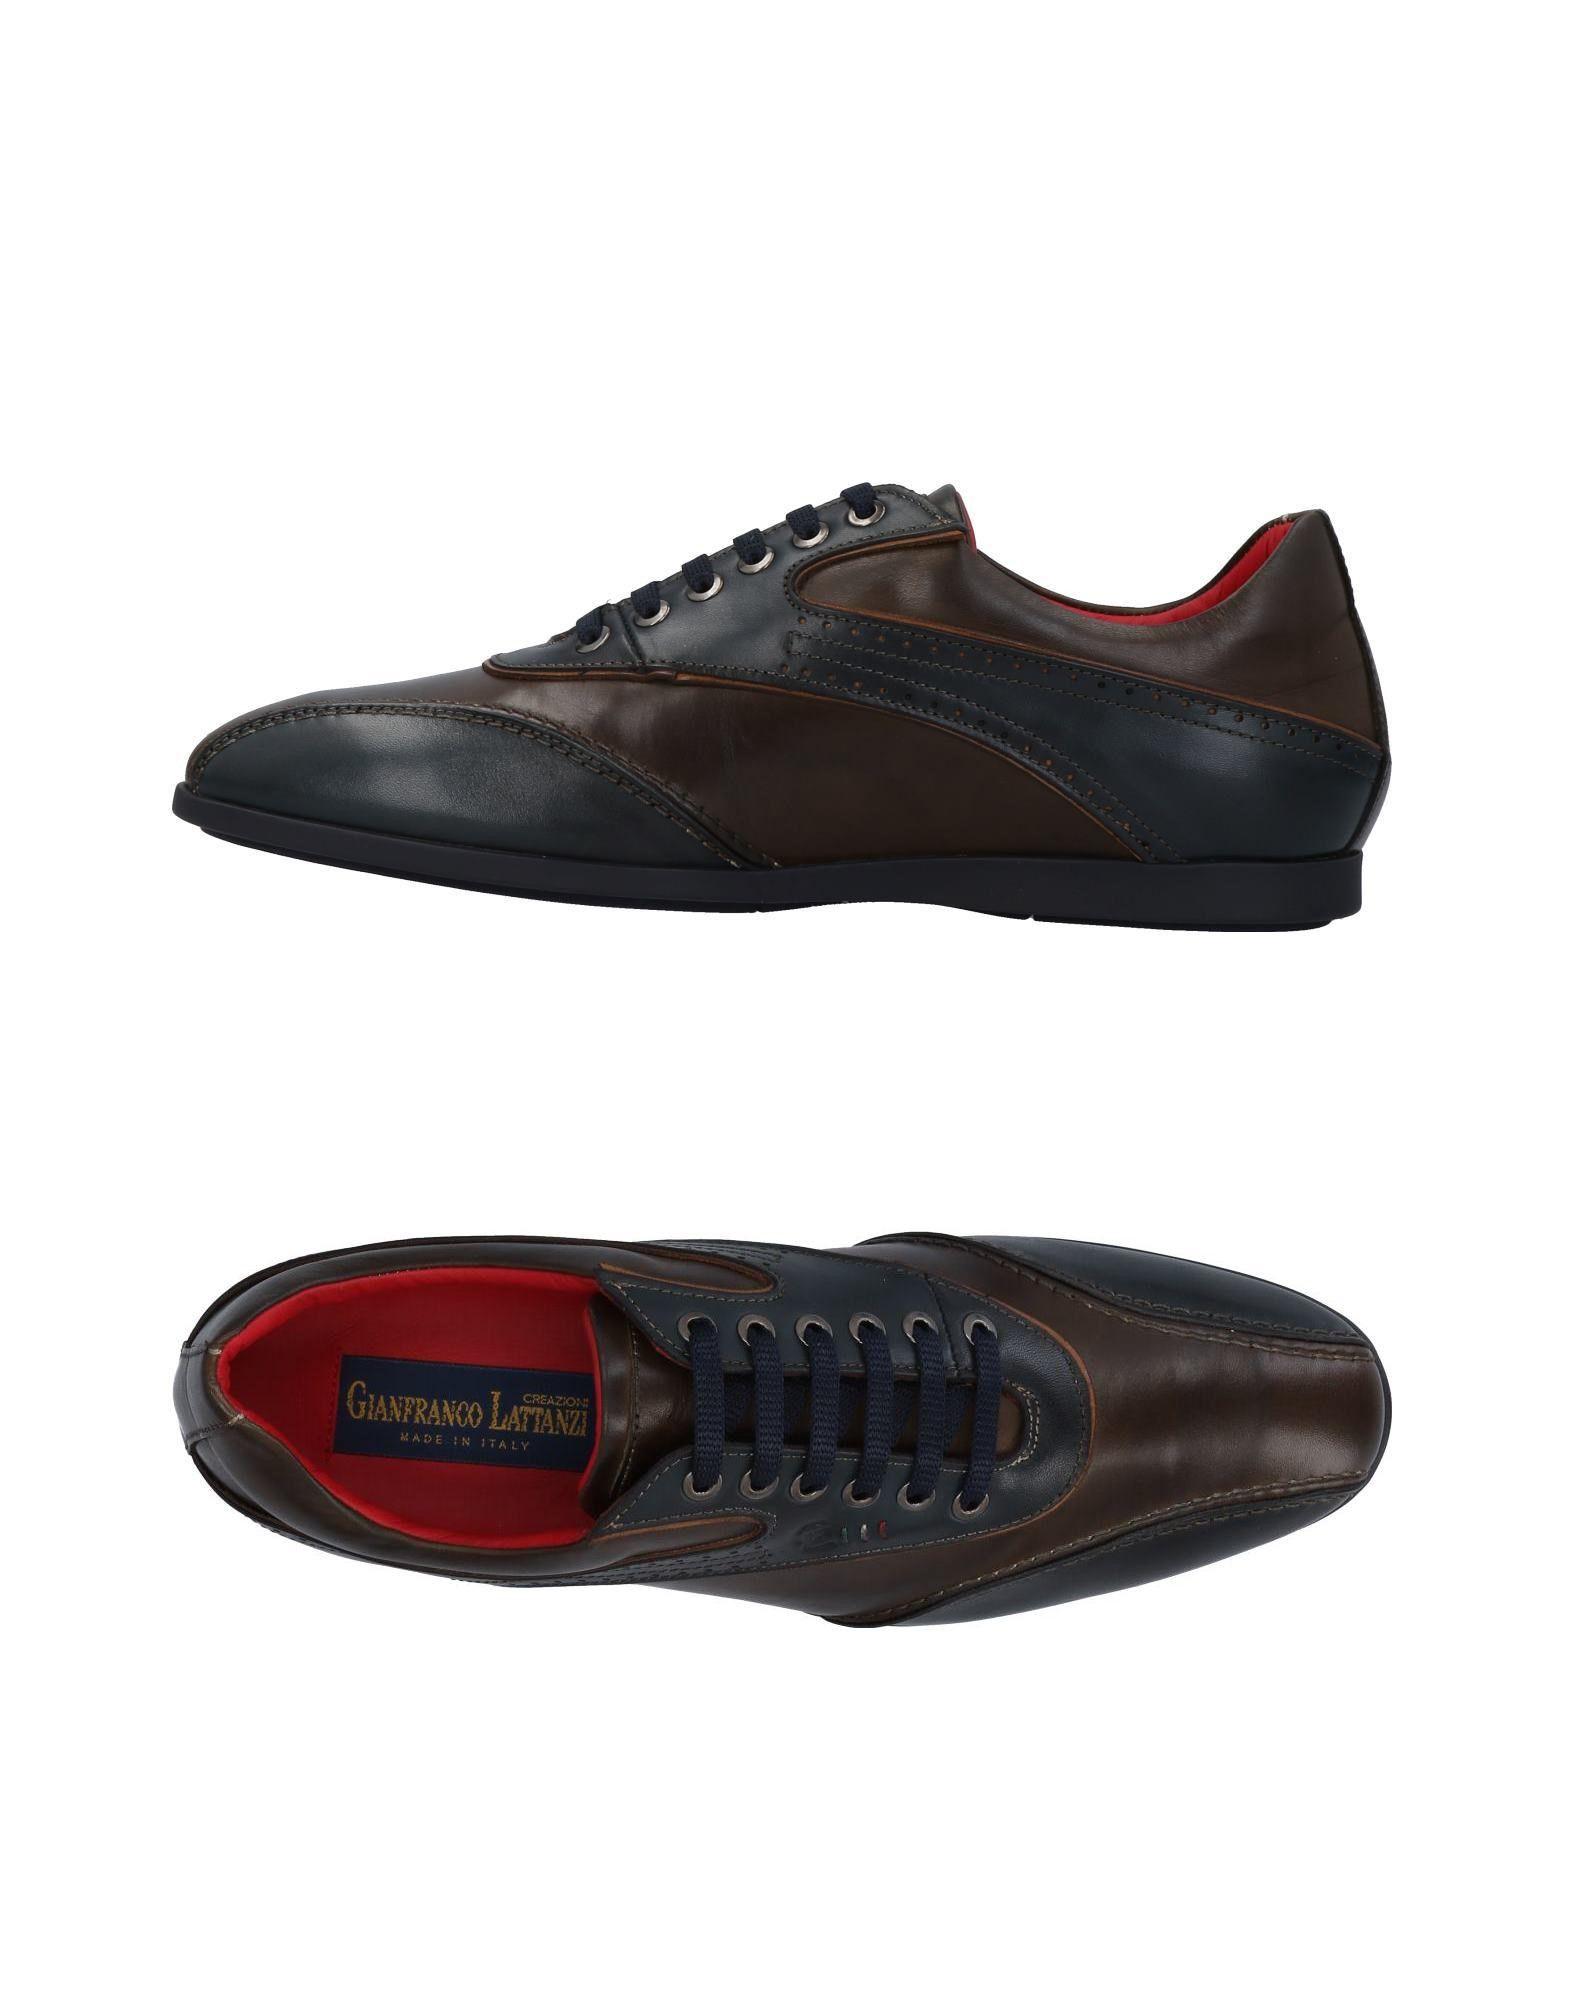 Gianfranco Herren Lattanzi Sneakers Herren Gianfranco  11453935IA 60d9c4